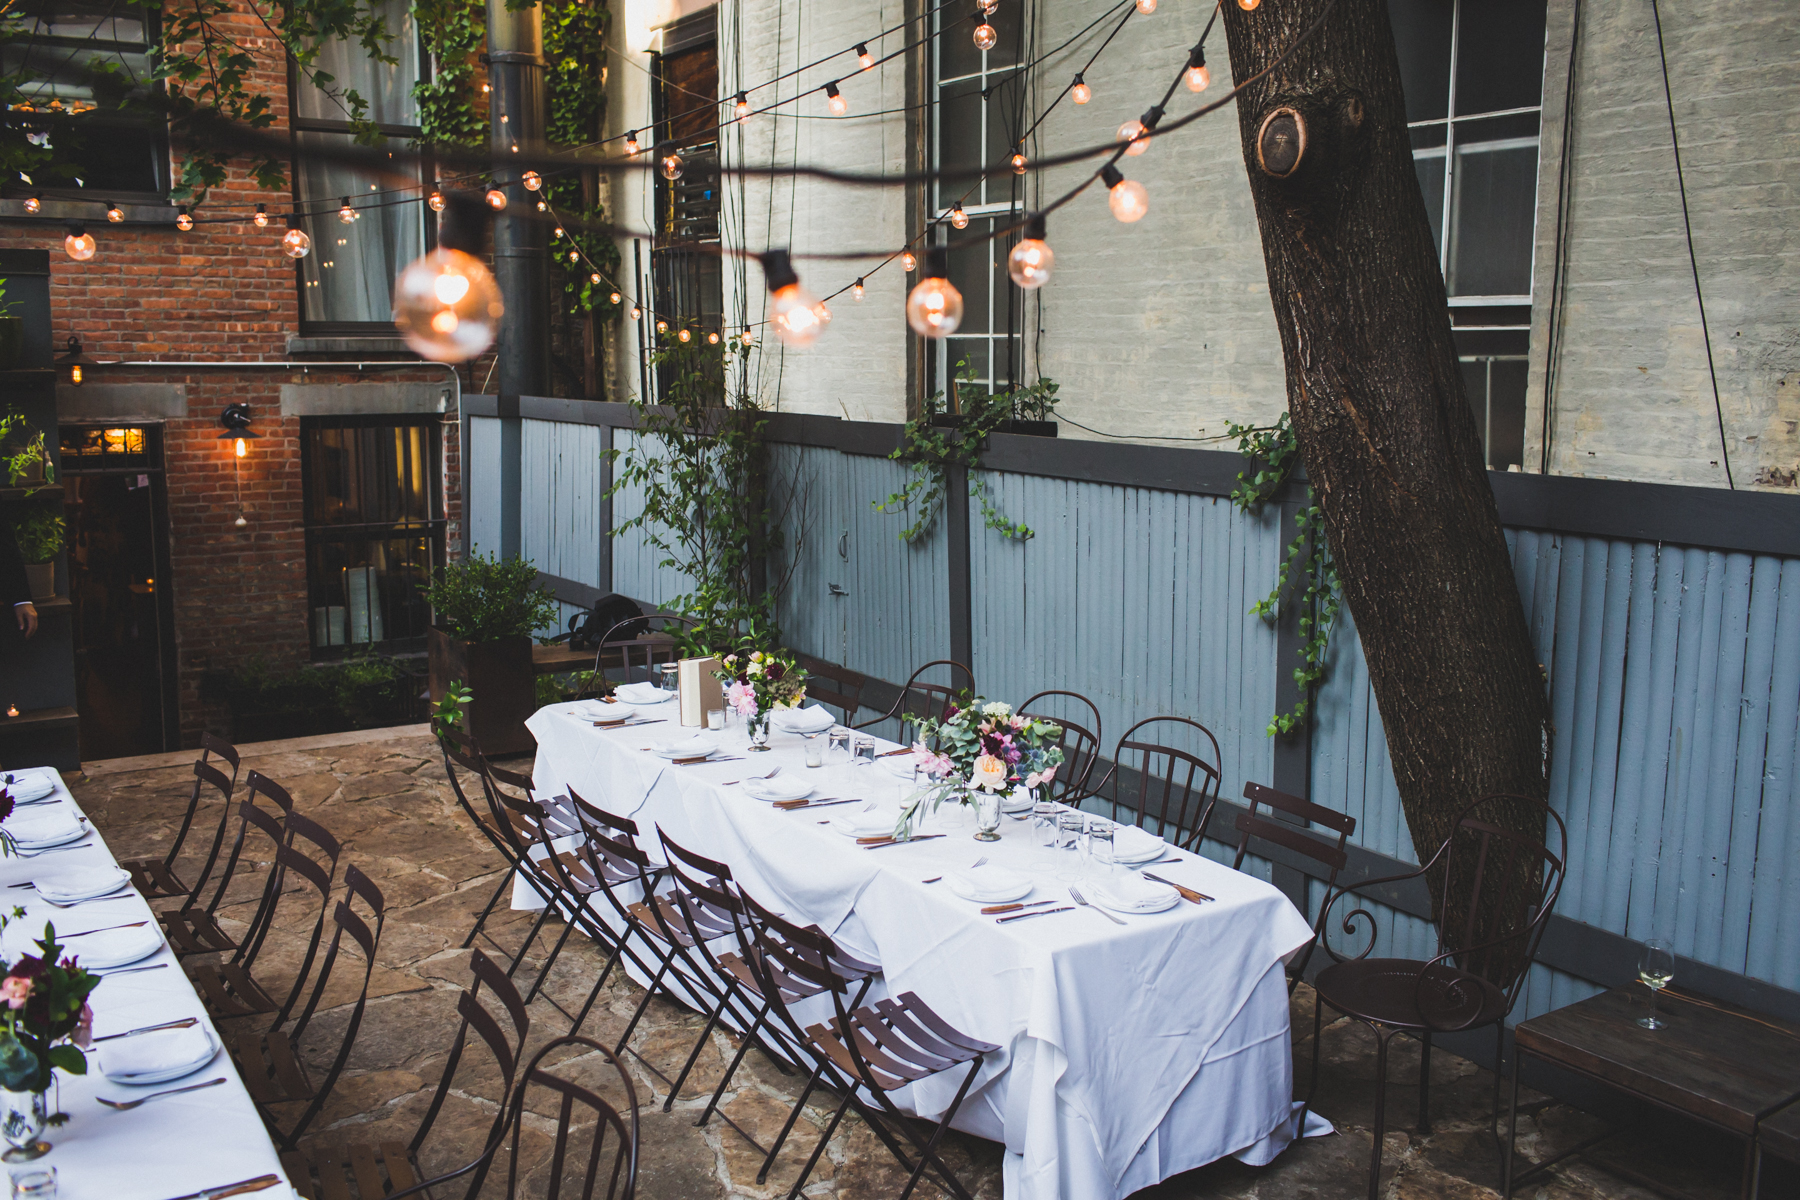 ICI-Restaurant-Fort-Greene-Brooklyn-Intimate-Documentary-Wedding-Photography-Elvira-Kalviste-61.jpg